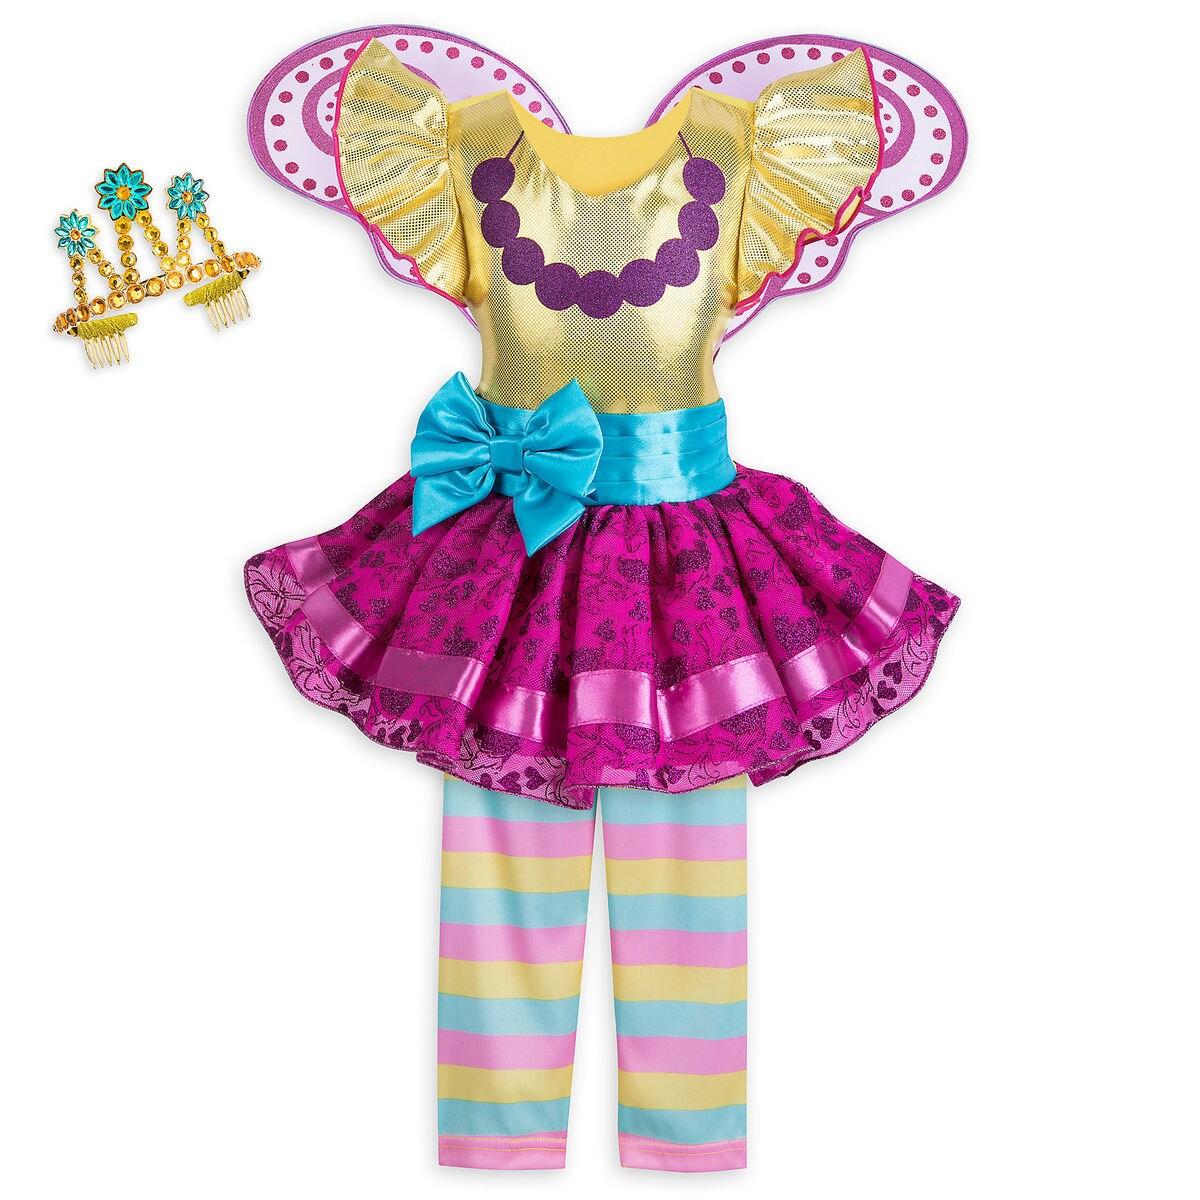 fancy nancy costume set for kids | shopdisney